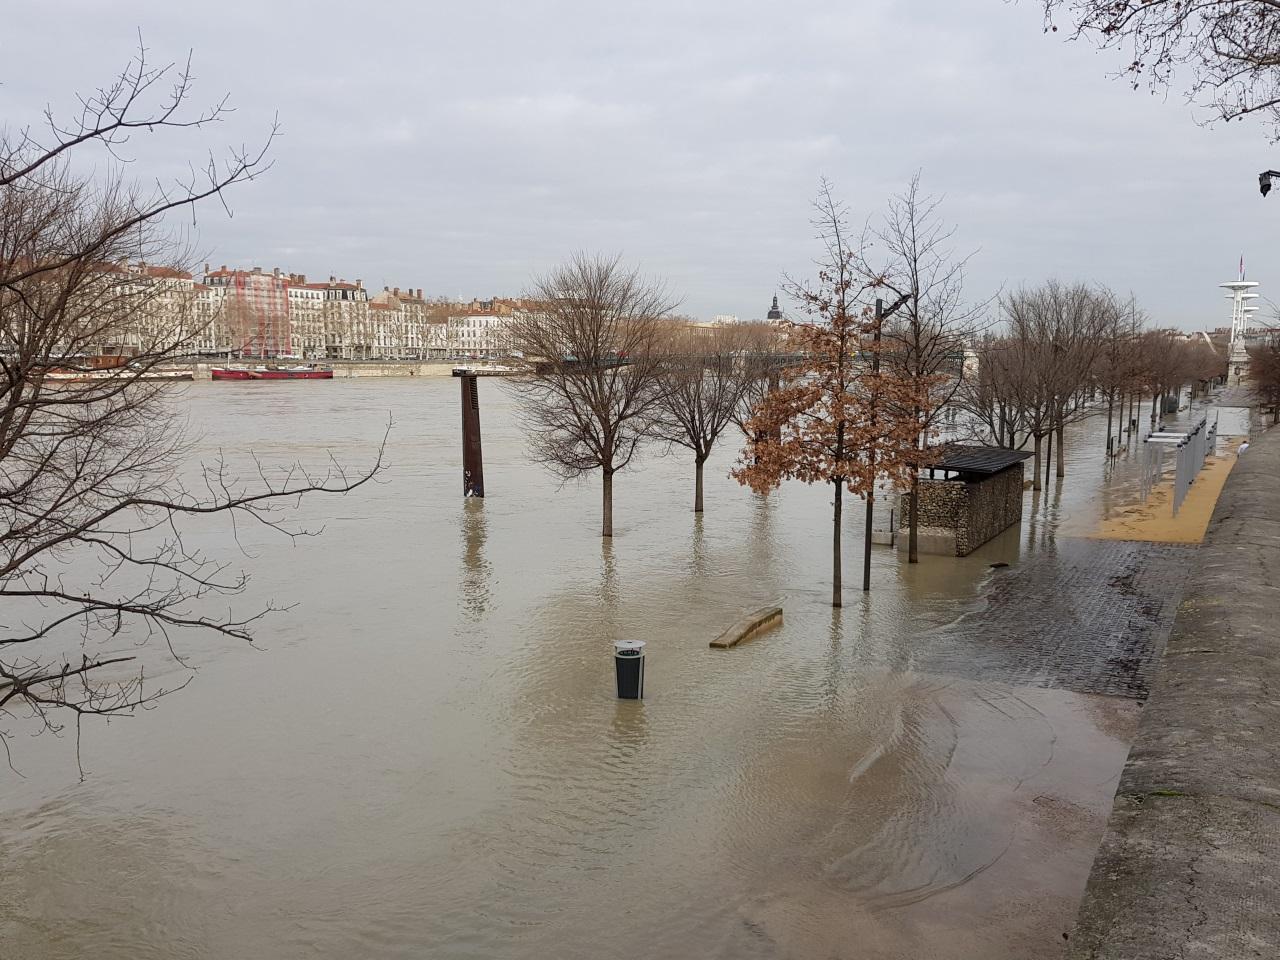 Le Rhône débordait ce mardi matin à Lyon - LyonMag